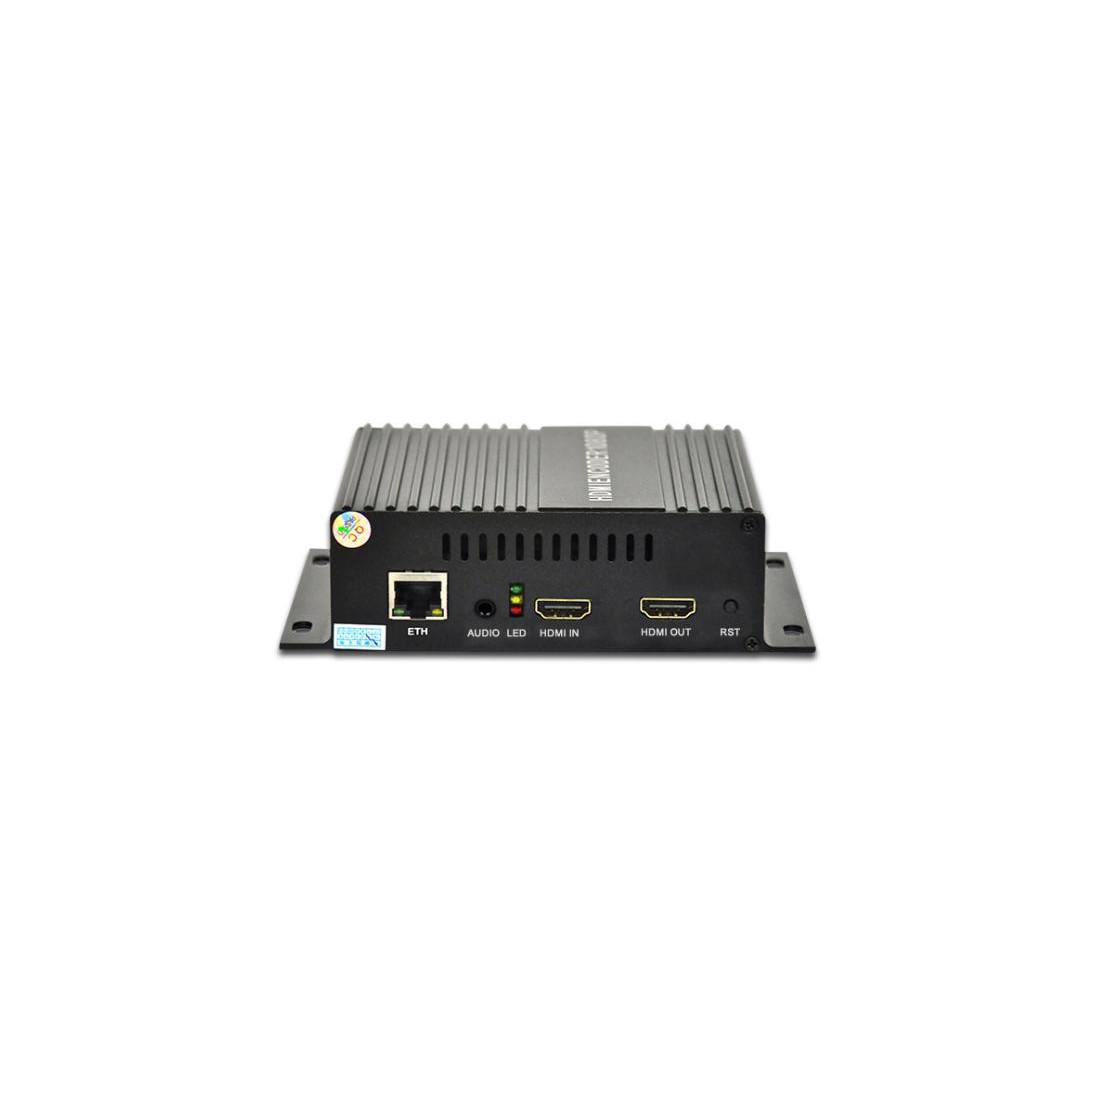 Video encoder Digicast DMB-8800A plus